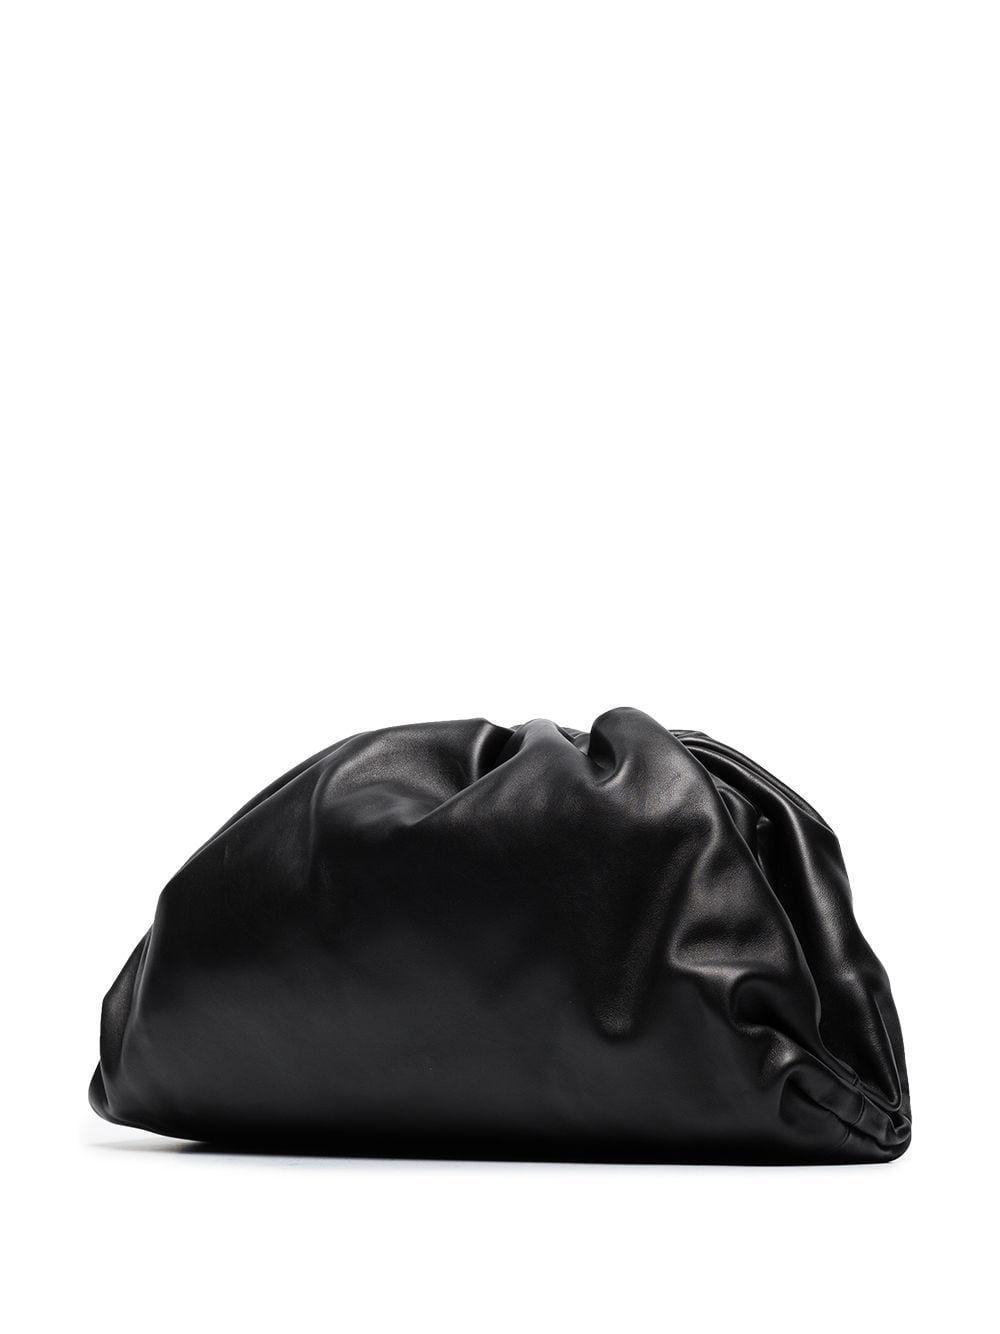 Picture of Bottega Veneta   The Pouch